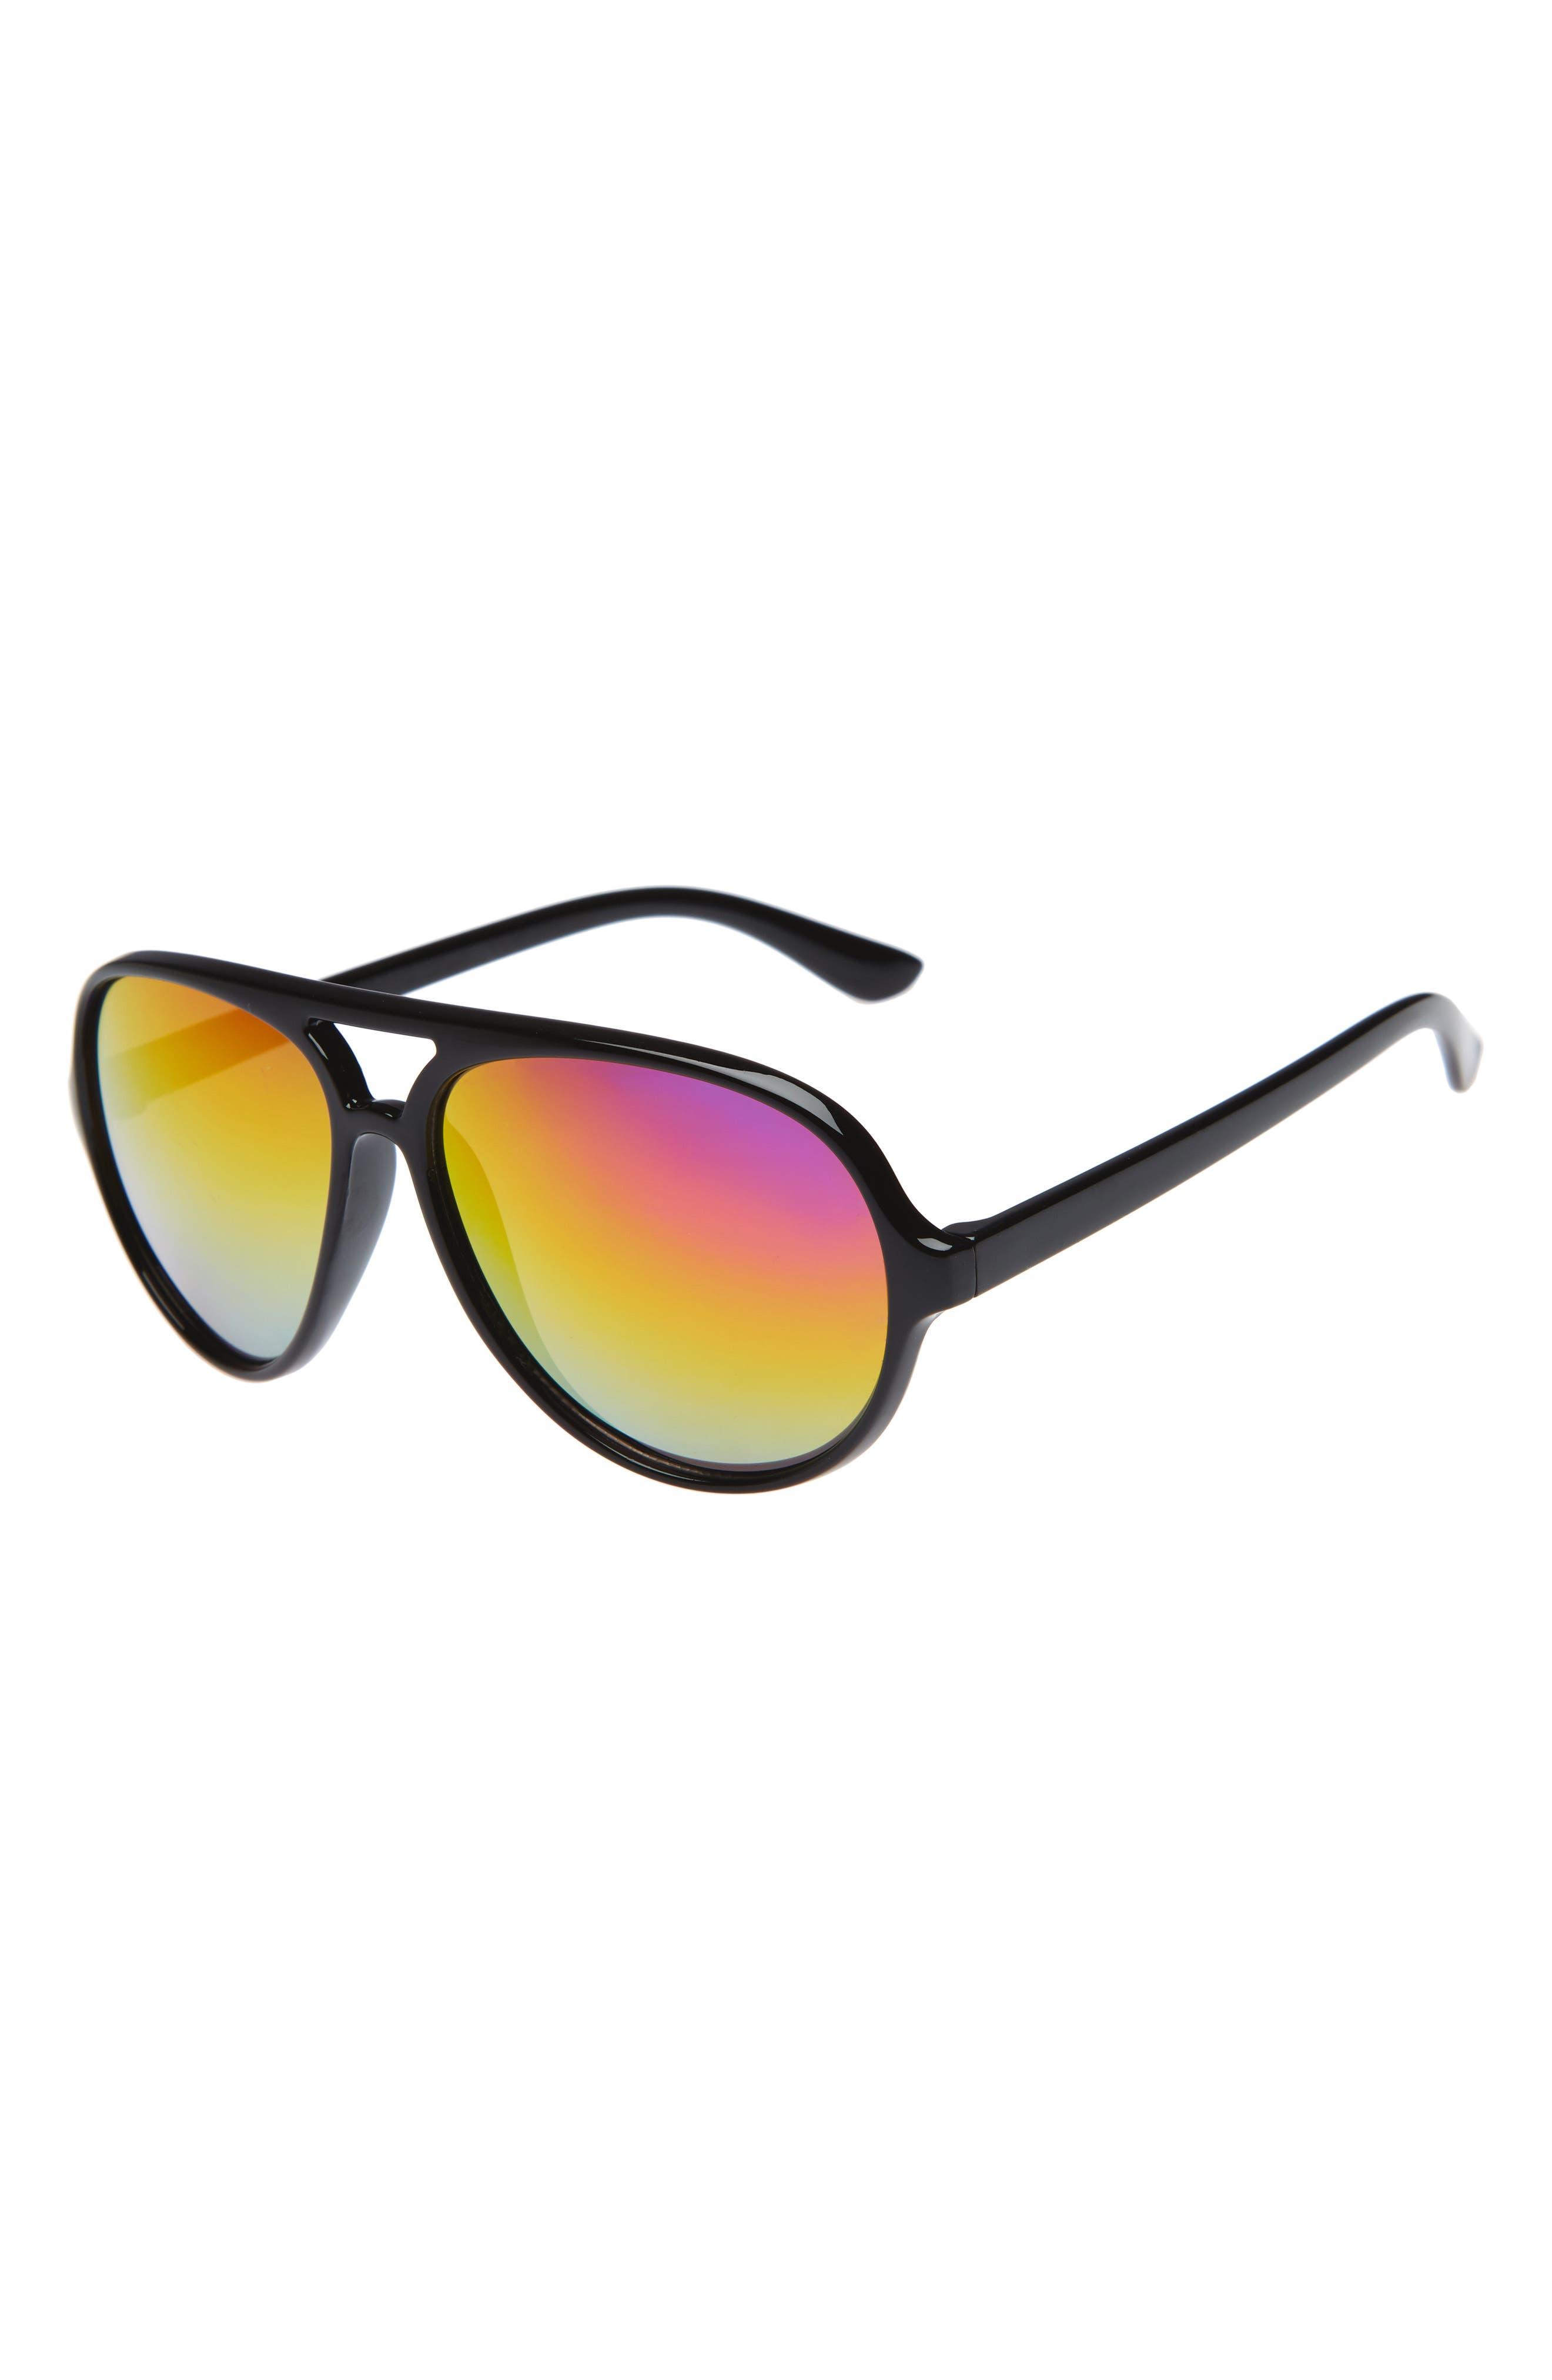 Mirrored Aviator Sunglasses,                         Main,                         color, Black